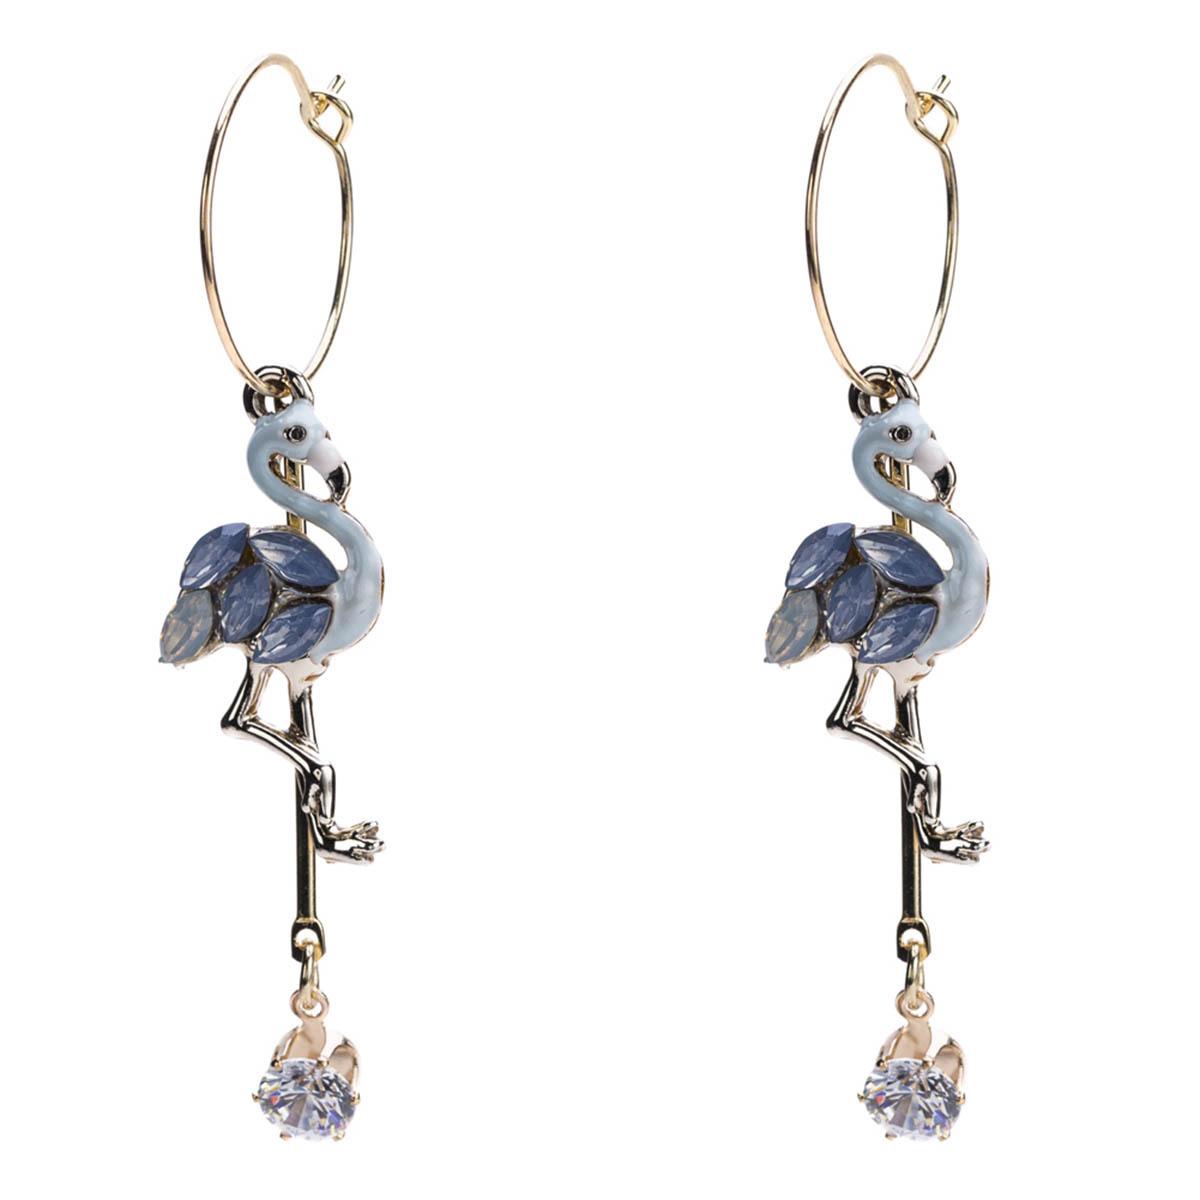 Alloy Fashion Animal earring(white) NHJE1219-white